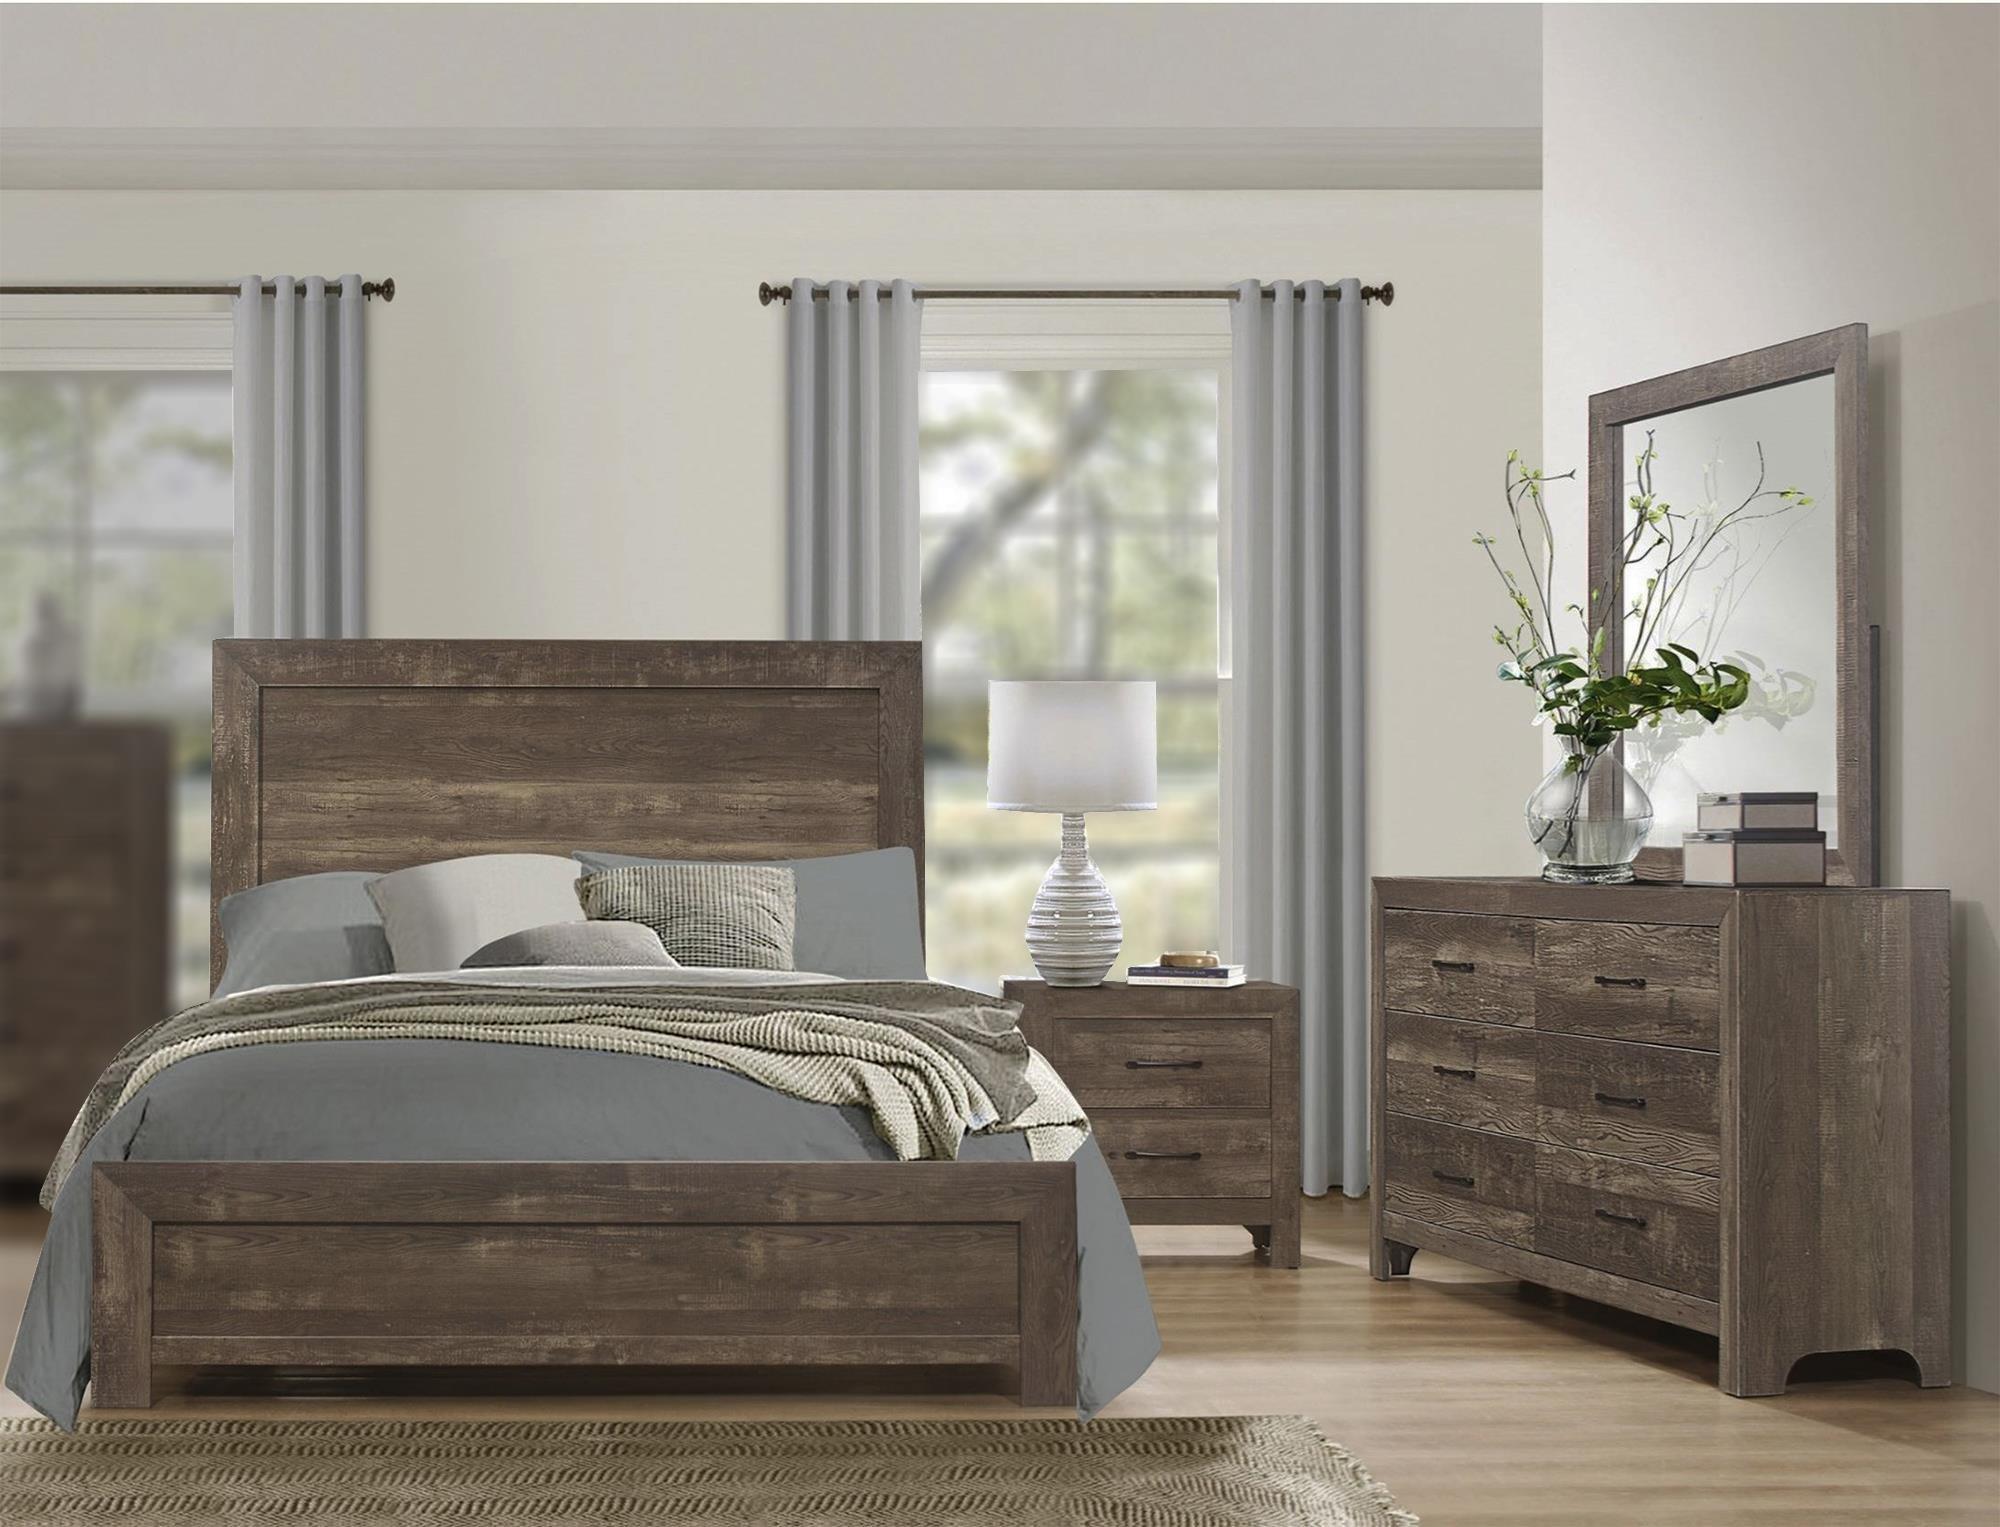 Bernsen 4PC King Bedroom Set at Rotmans